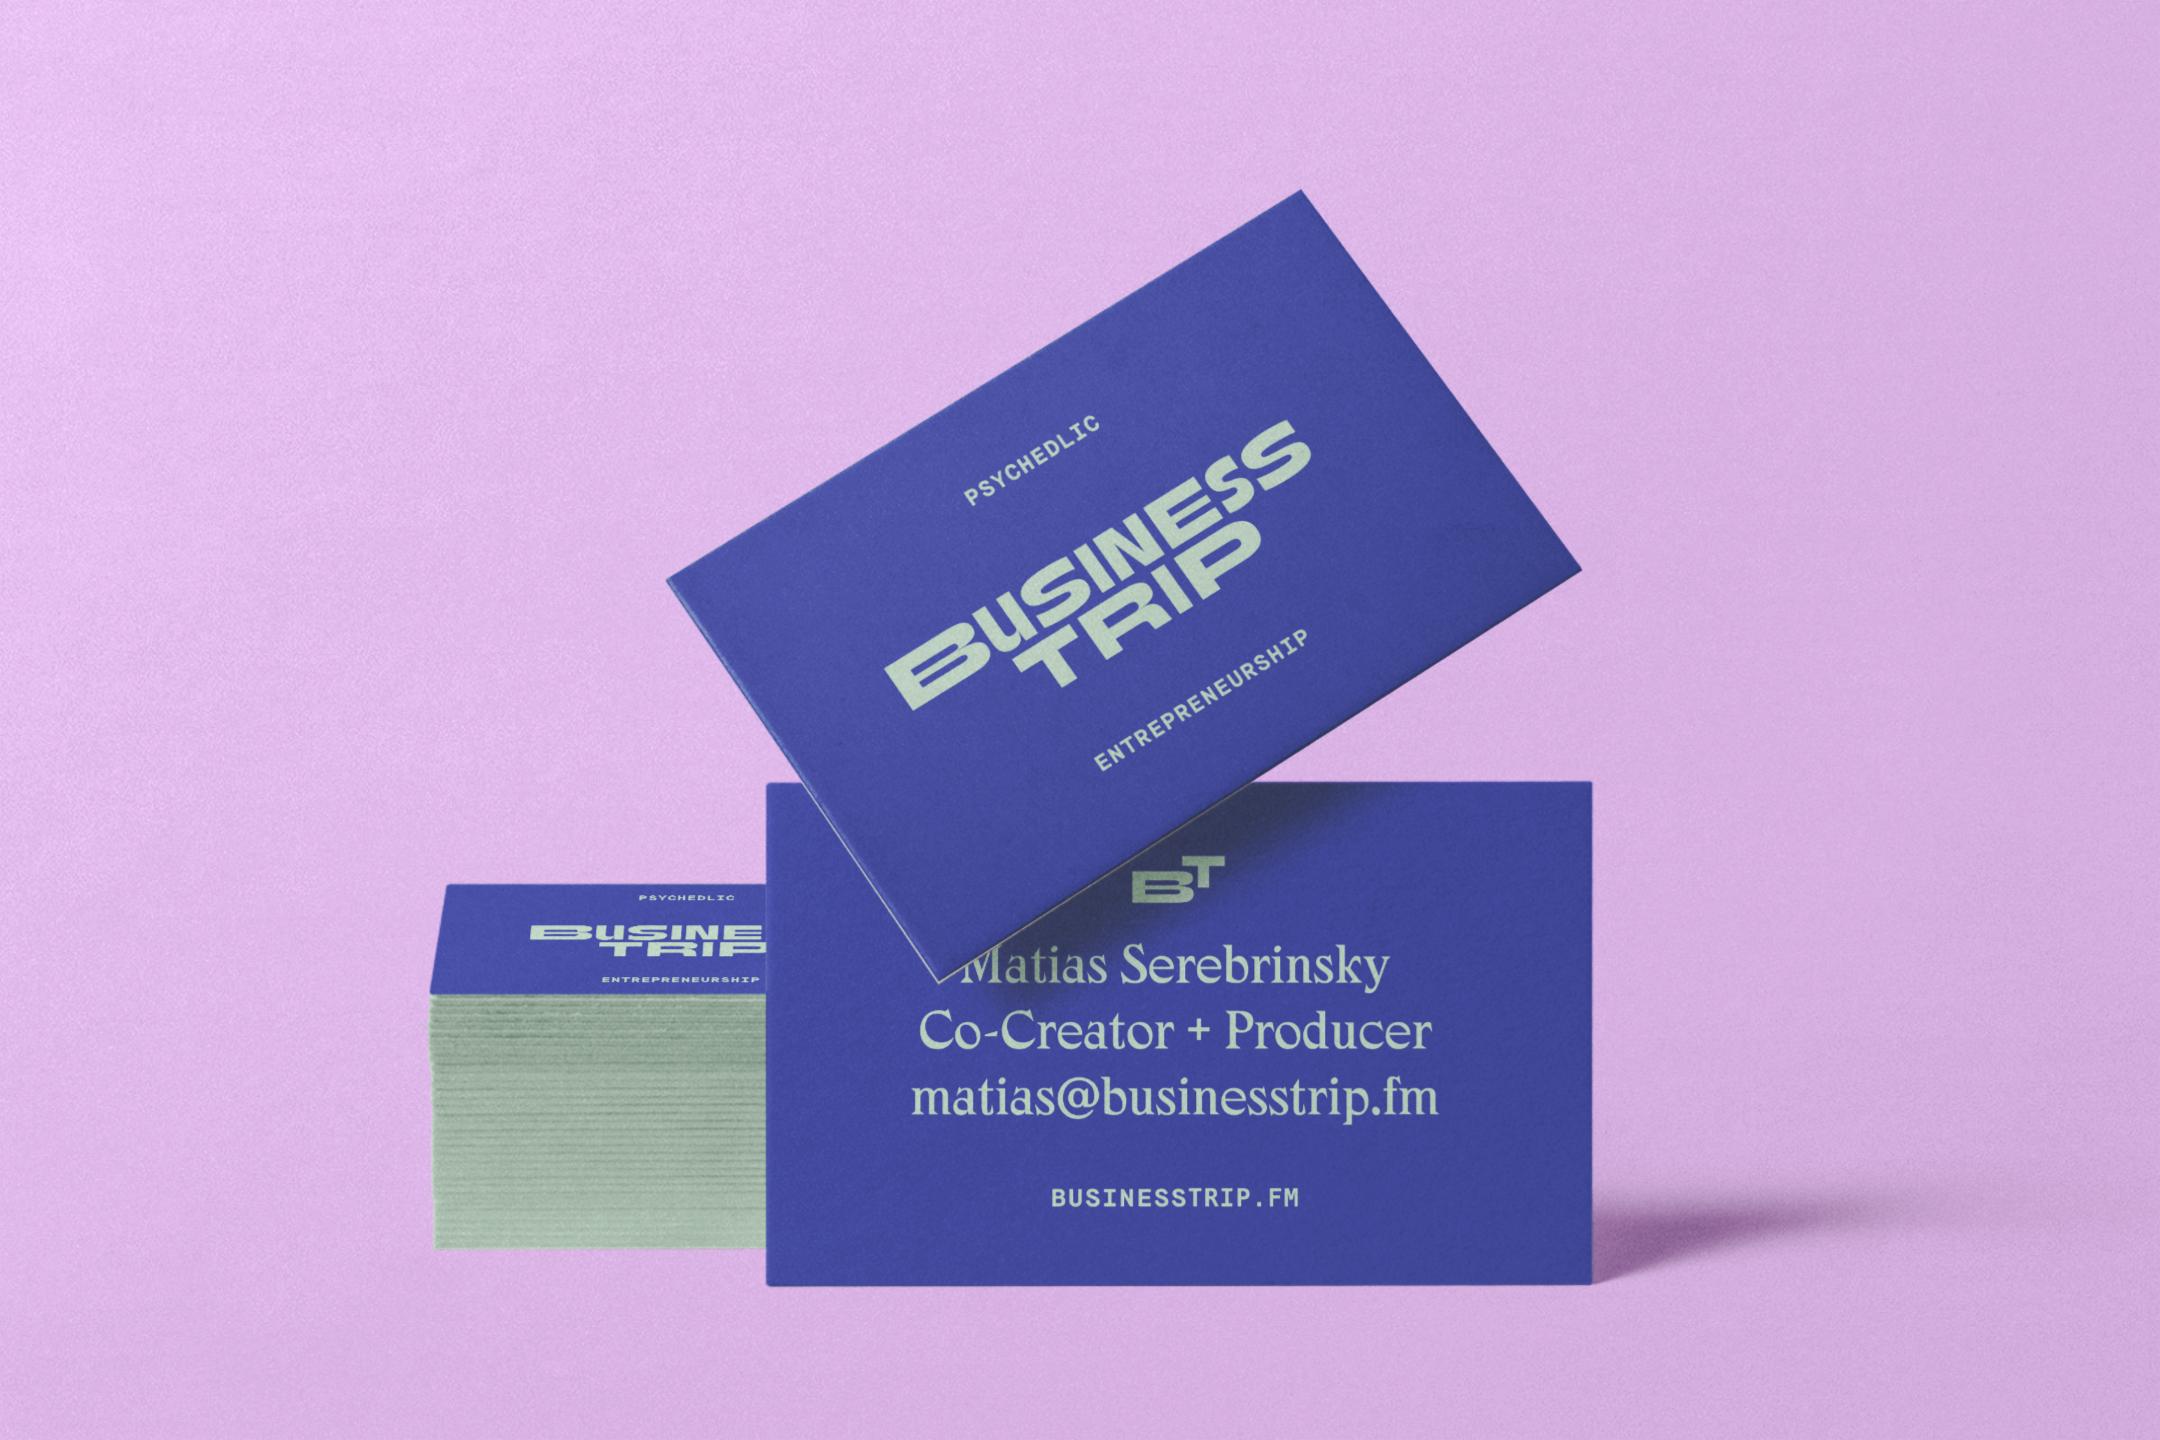 business-card-mockup-scene@2x